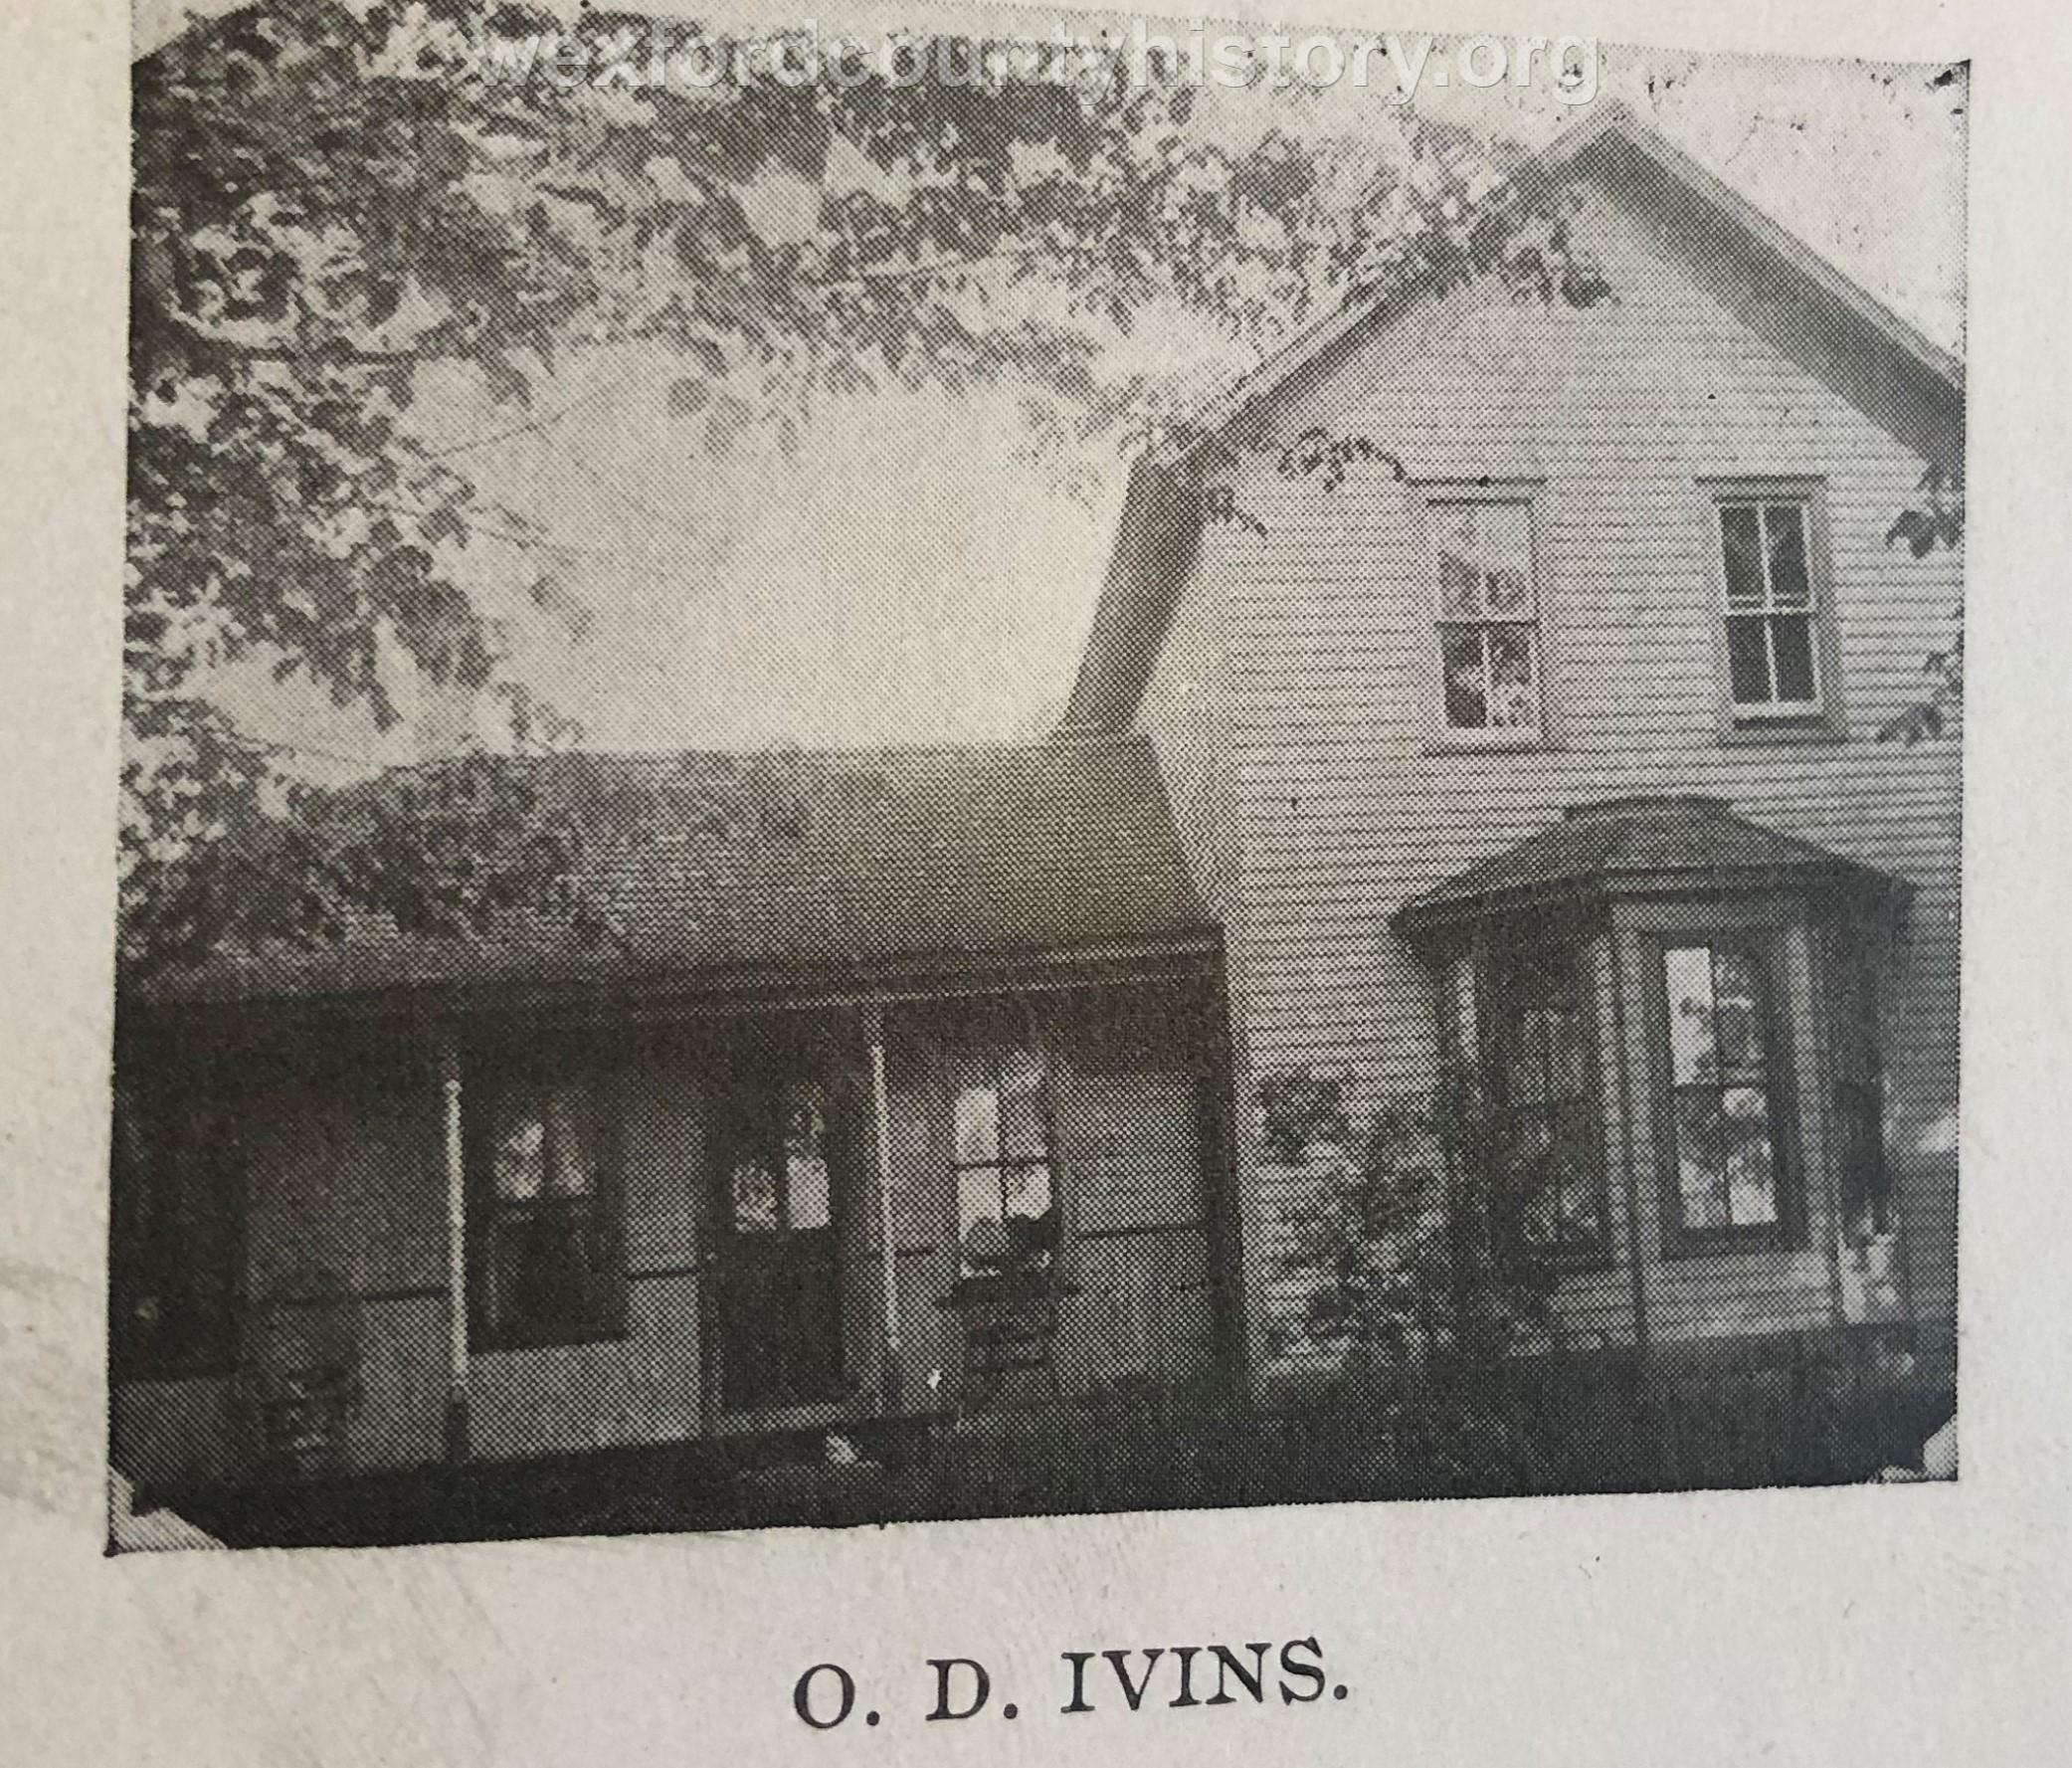 O. D. Ivins House